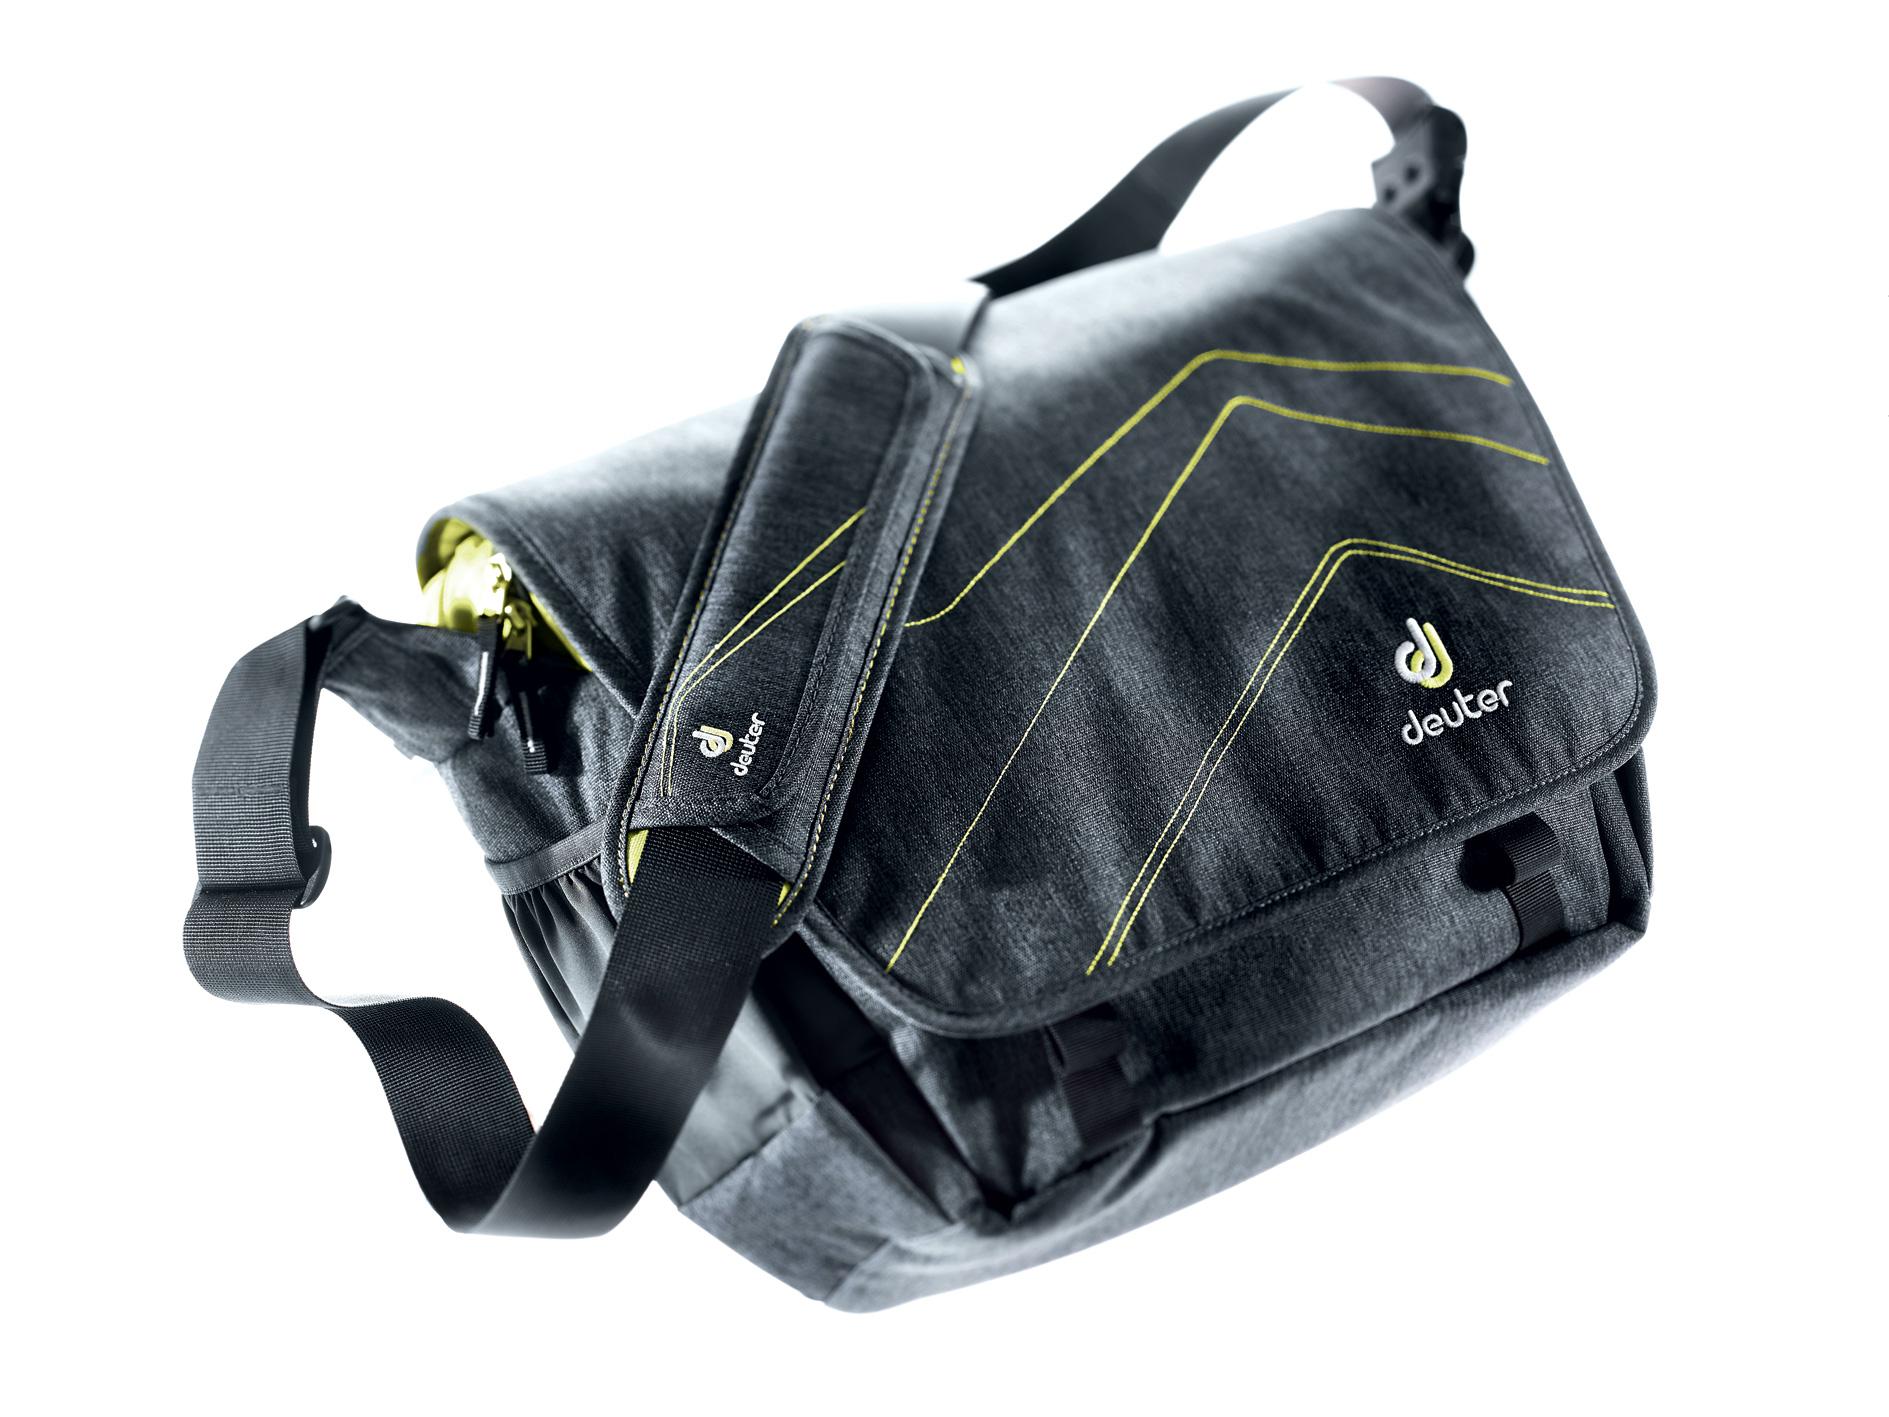 Сумка на плечо Deuter 2016-17 Operate II dresscode-moss (б/р:ONE SIZE)Городские сумки<br><br><br>Бренд: Deuter